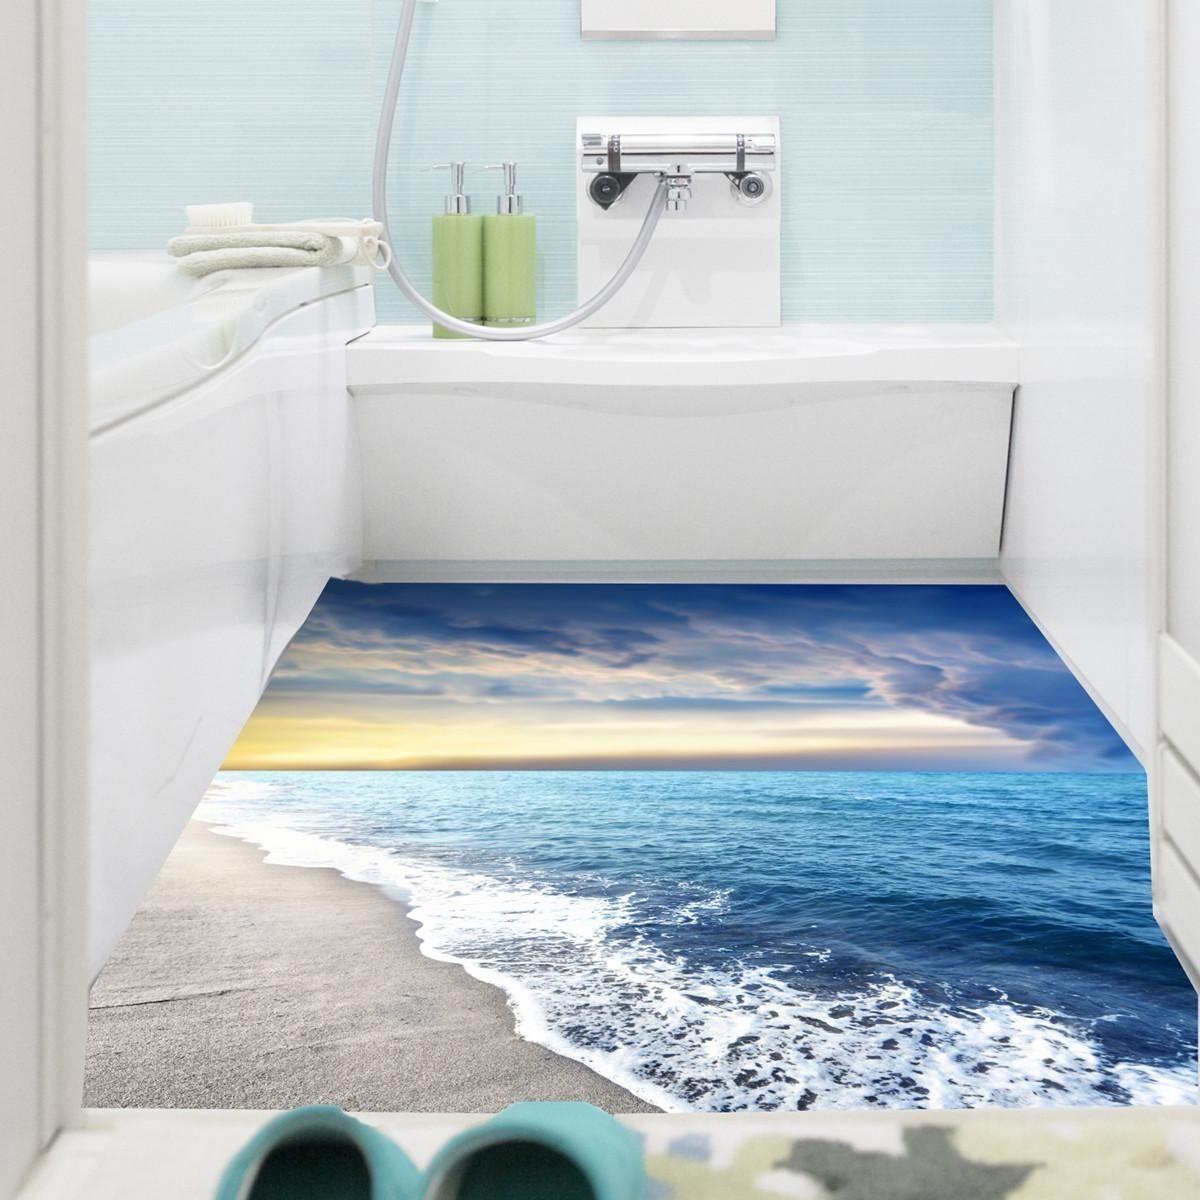 Generic Self Adhesive Tile Floor Wall Sticker 3d Decal Diy